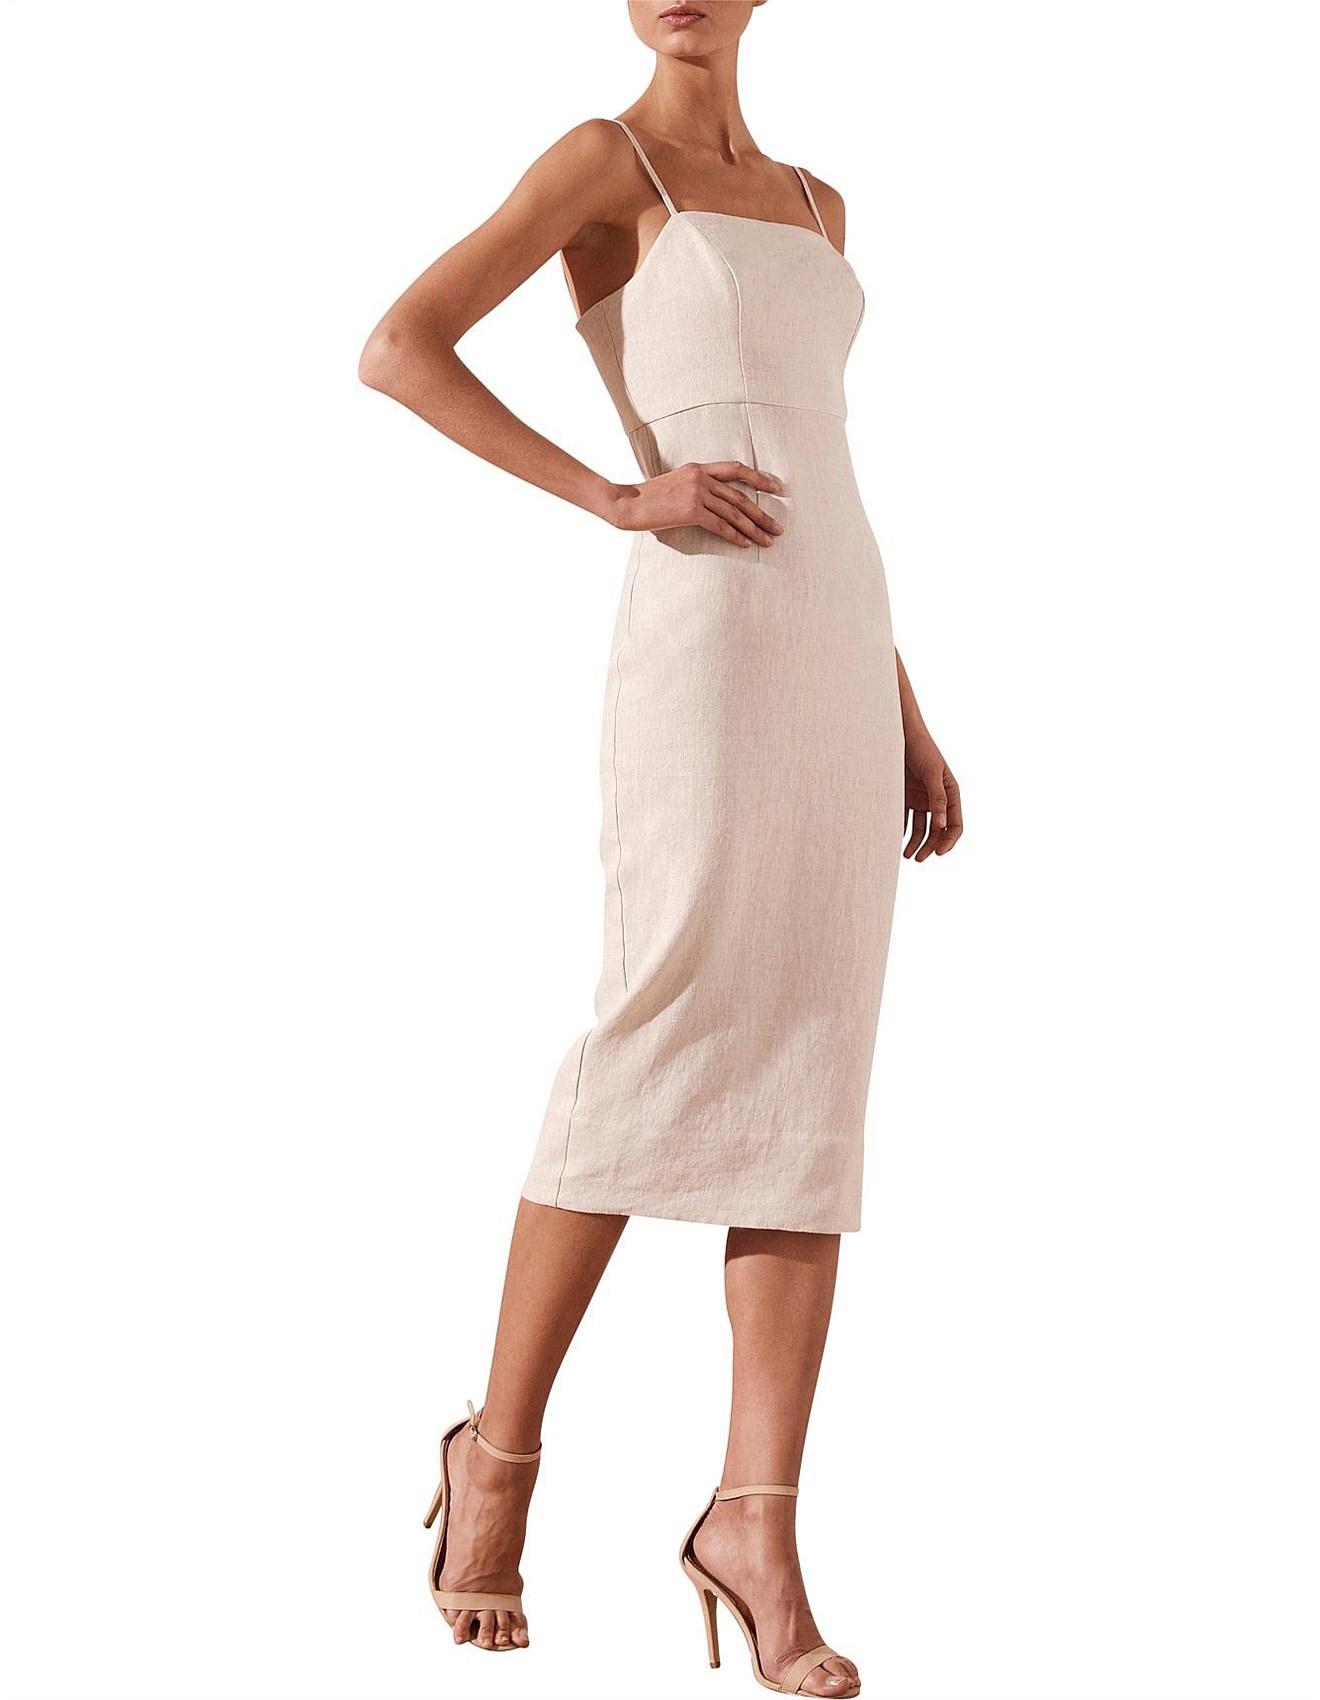 Aluaro Fitted Midi Dress a8d1e3f34a7d